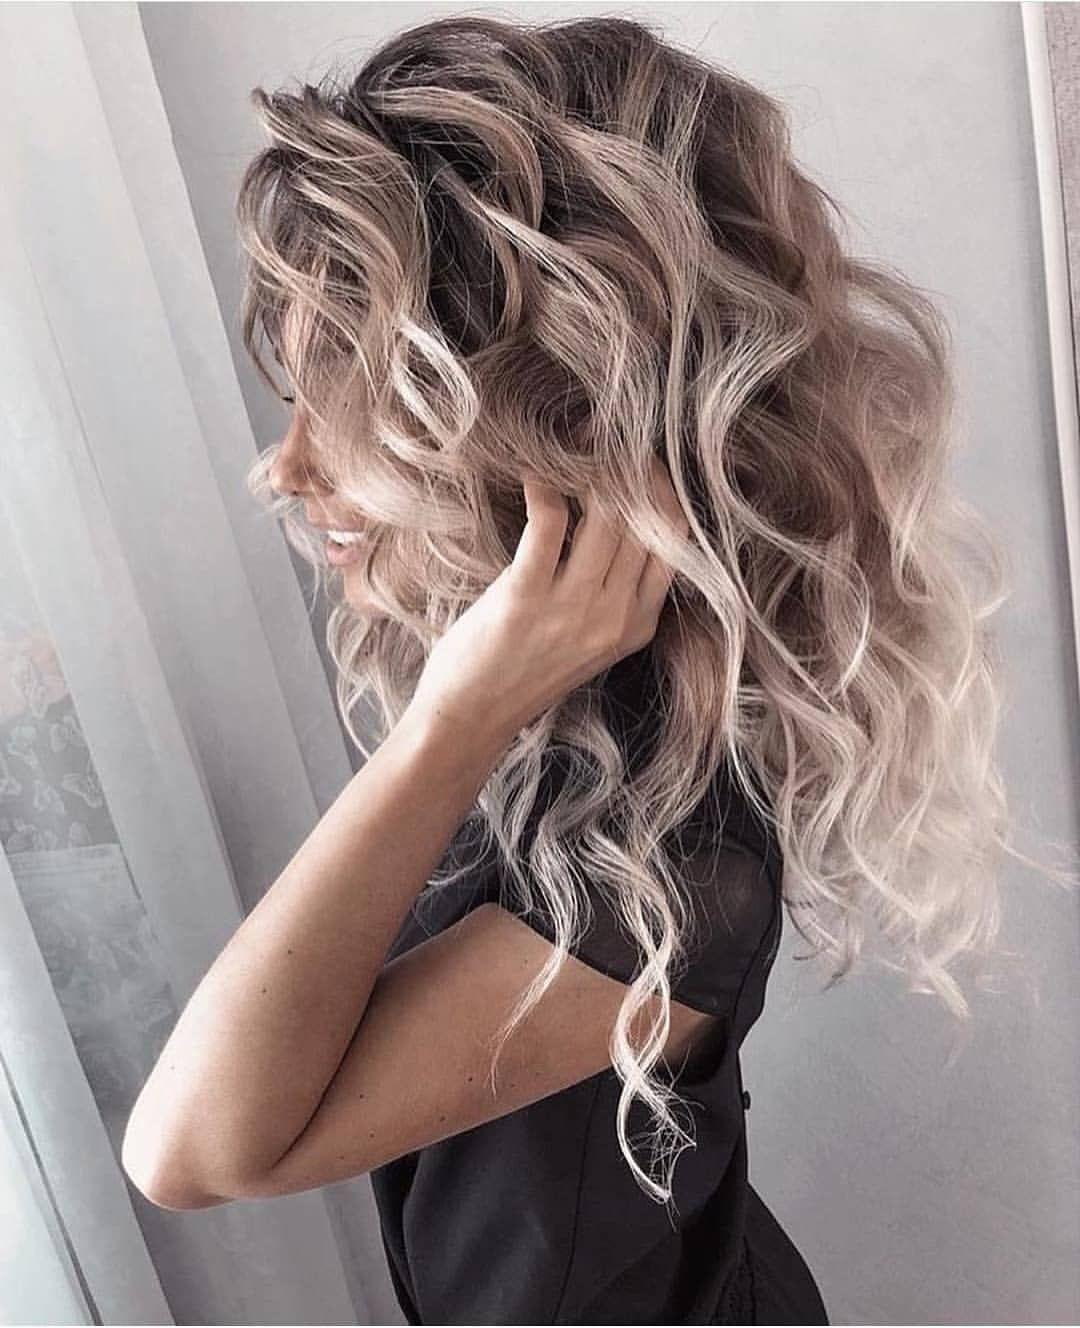 Pin By Jordan On Hair In 2019 | Hair Styles, Curly Hair Styles, Hair